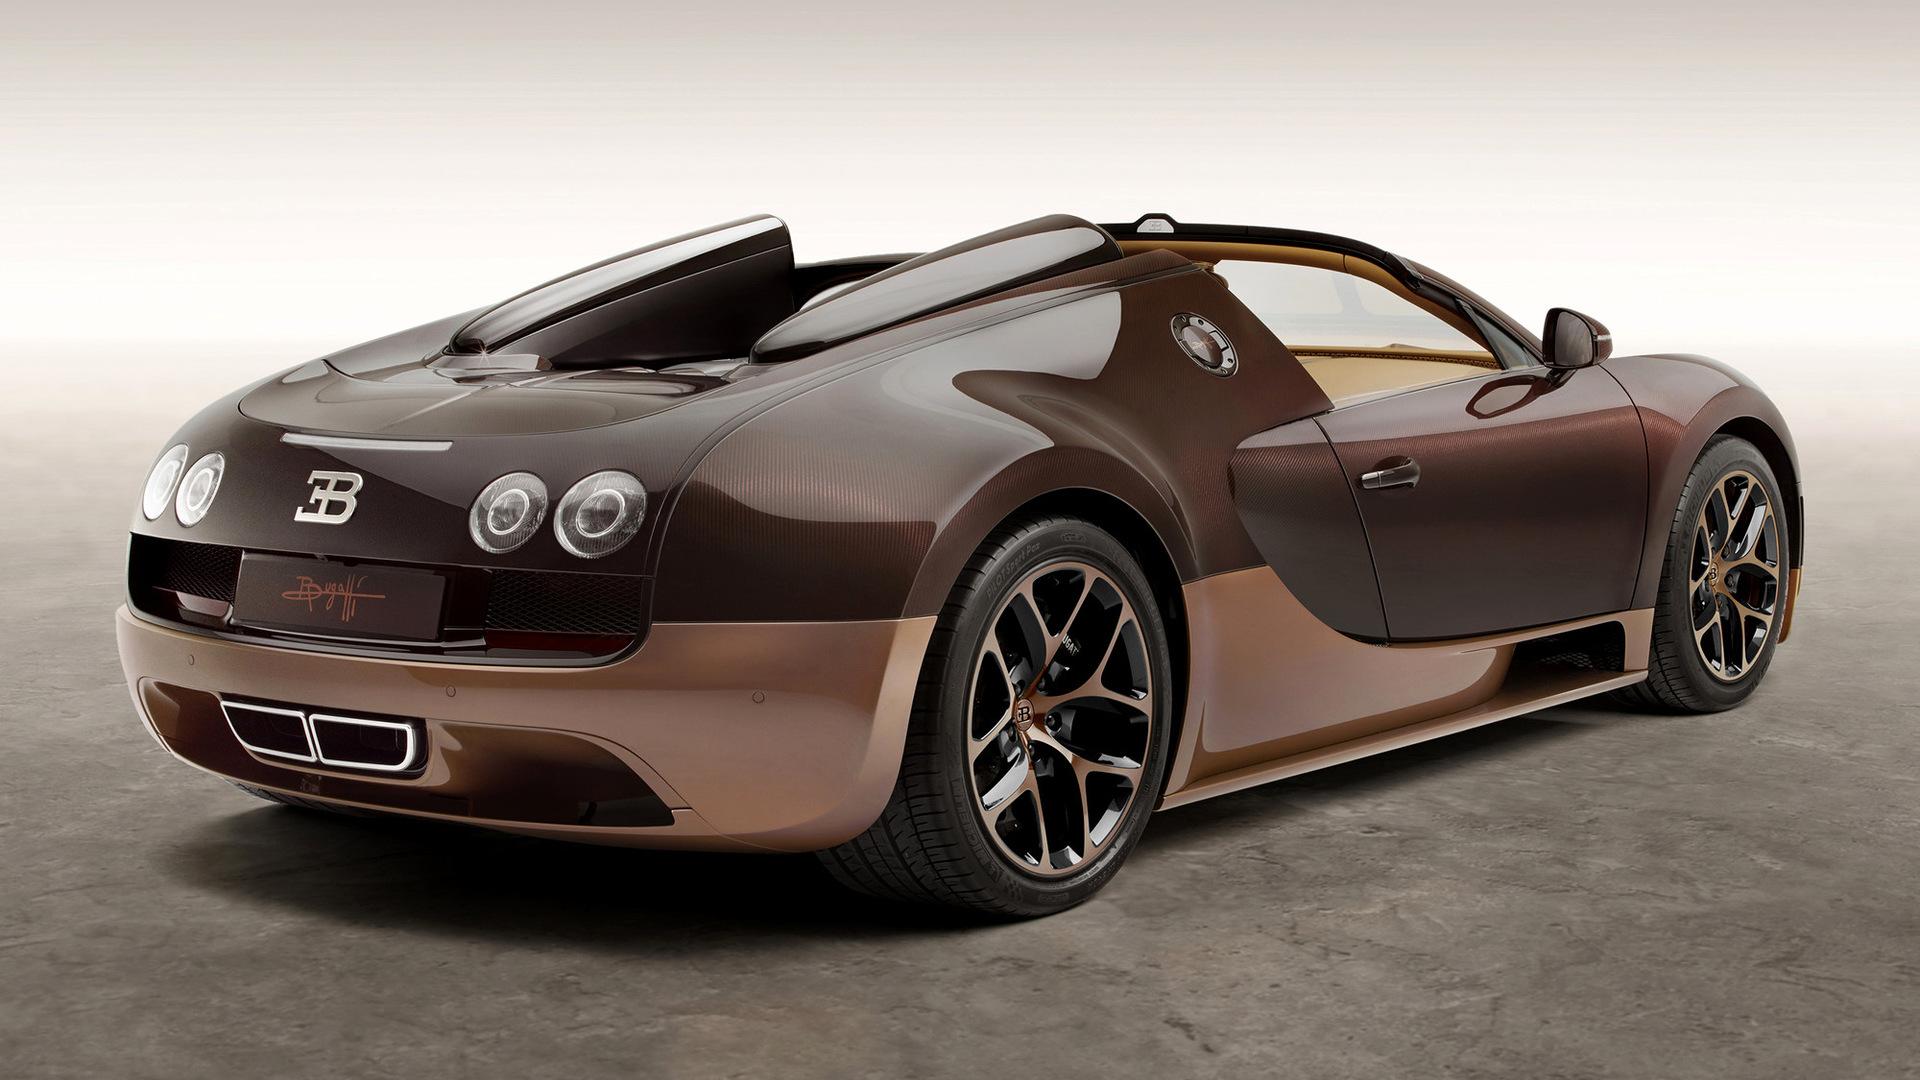 bugatti-veyron-grand-sport-vitesse-rembrandt-bugatti-wallpaper-hd-9922 Astounding Bugatti Veyron Grand Sport Vitesse Hd Cars Trend